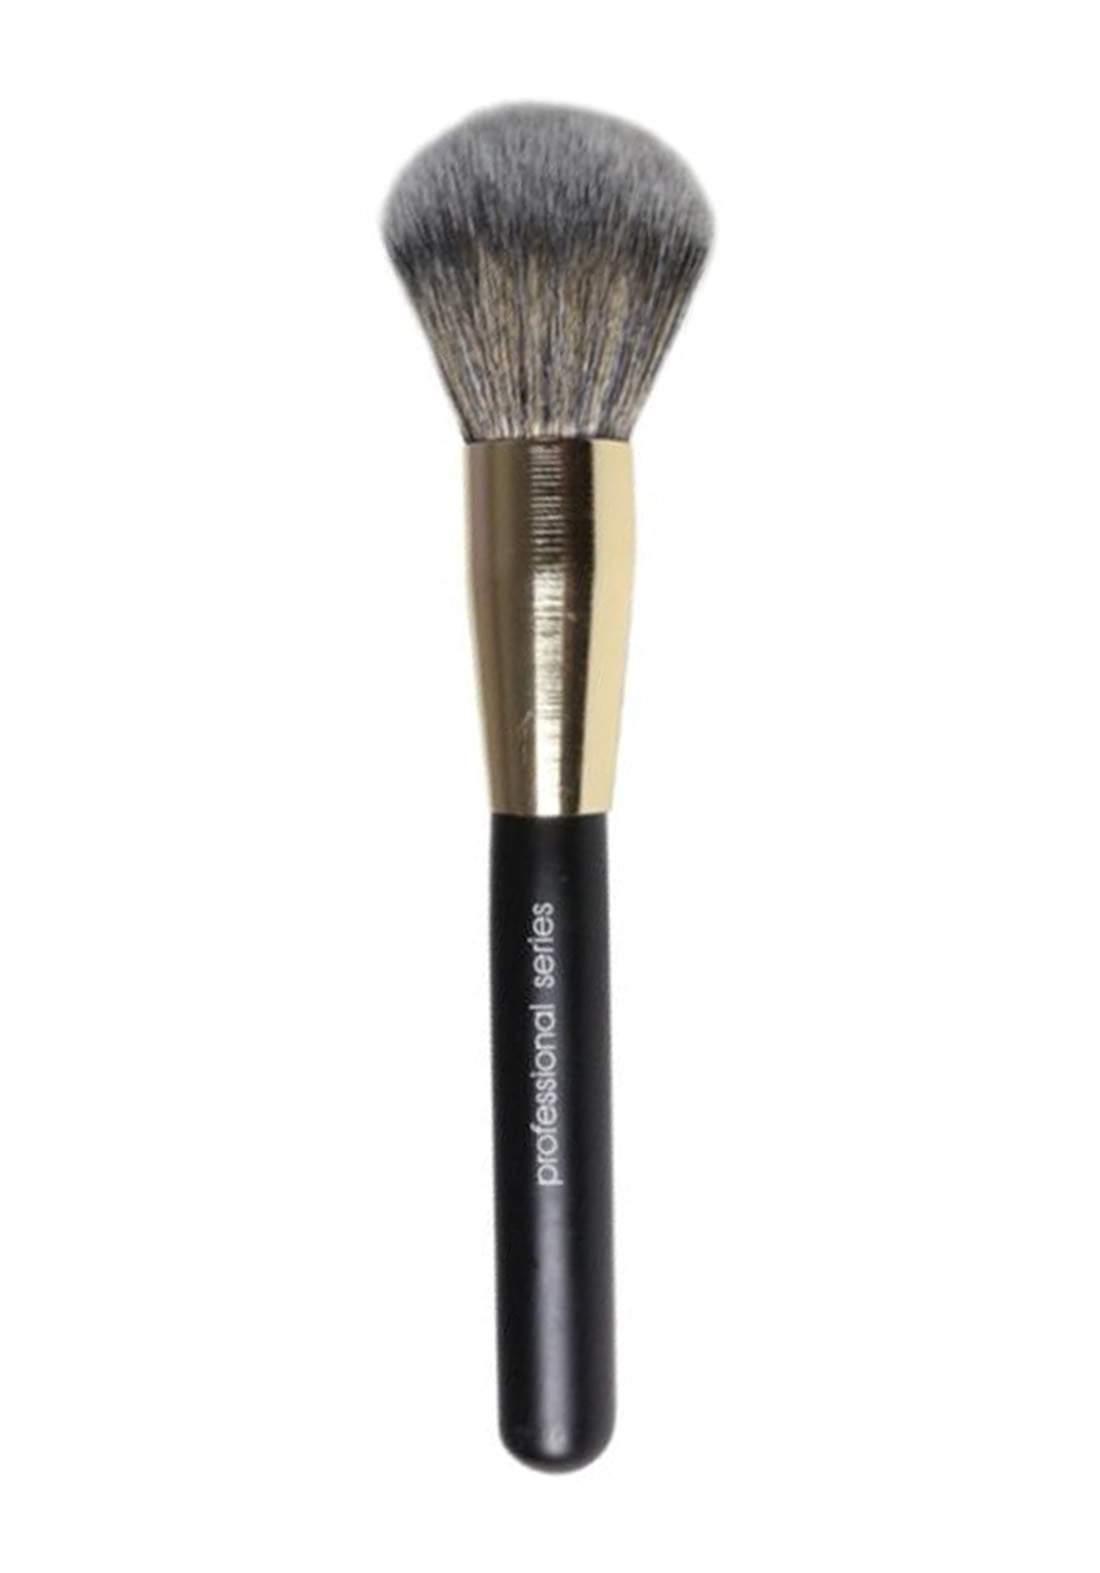 Nascita 0111 Large Oval Powder Brush فرشاة باودر